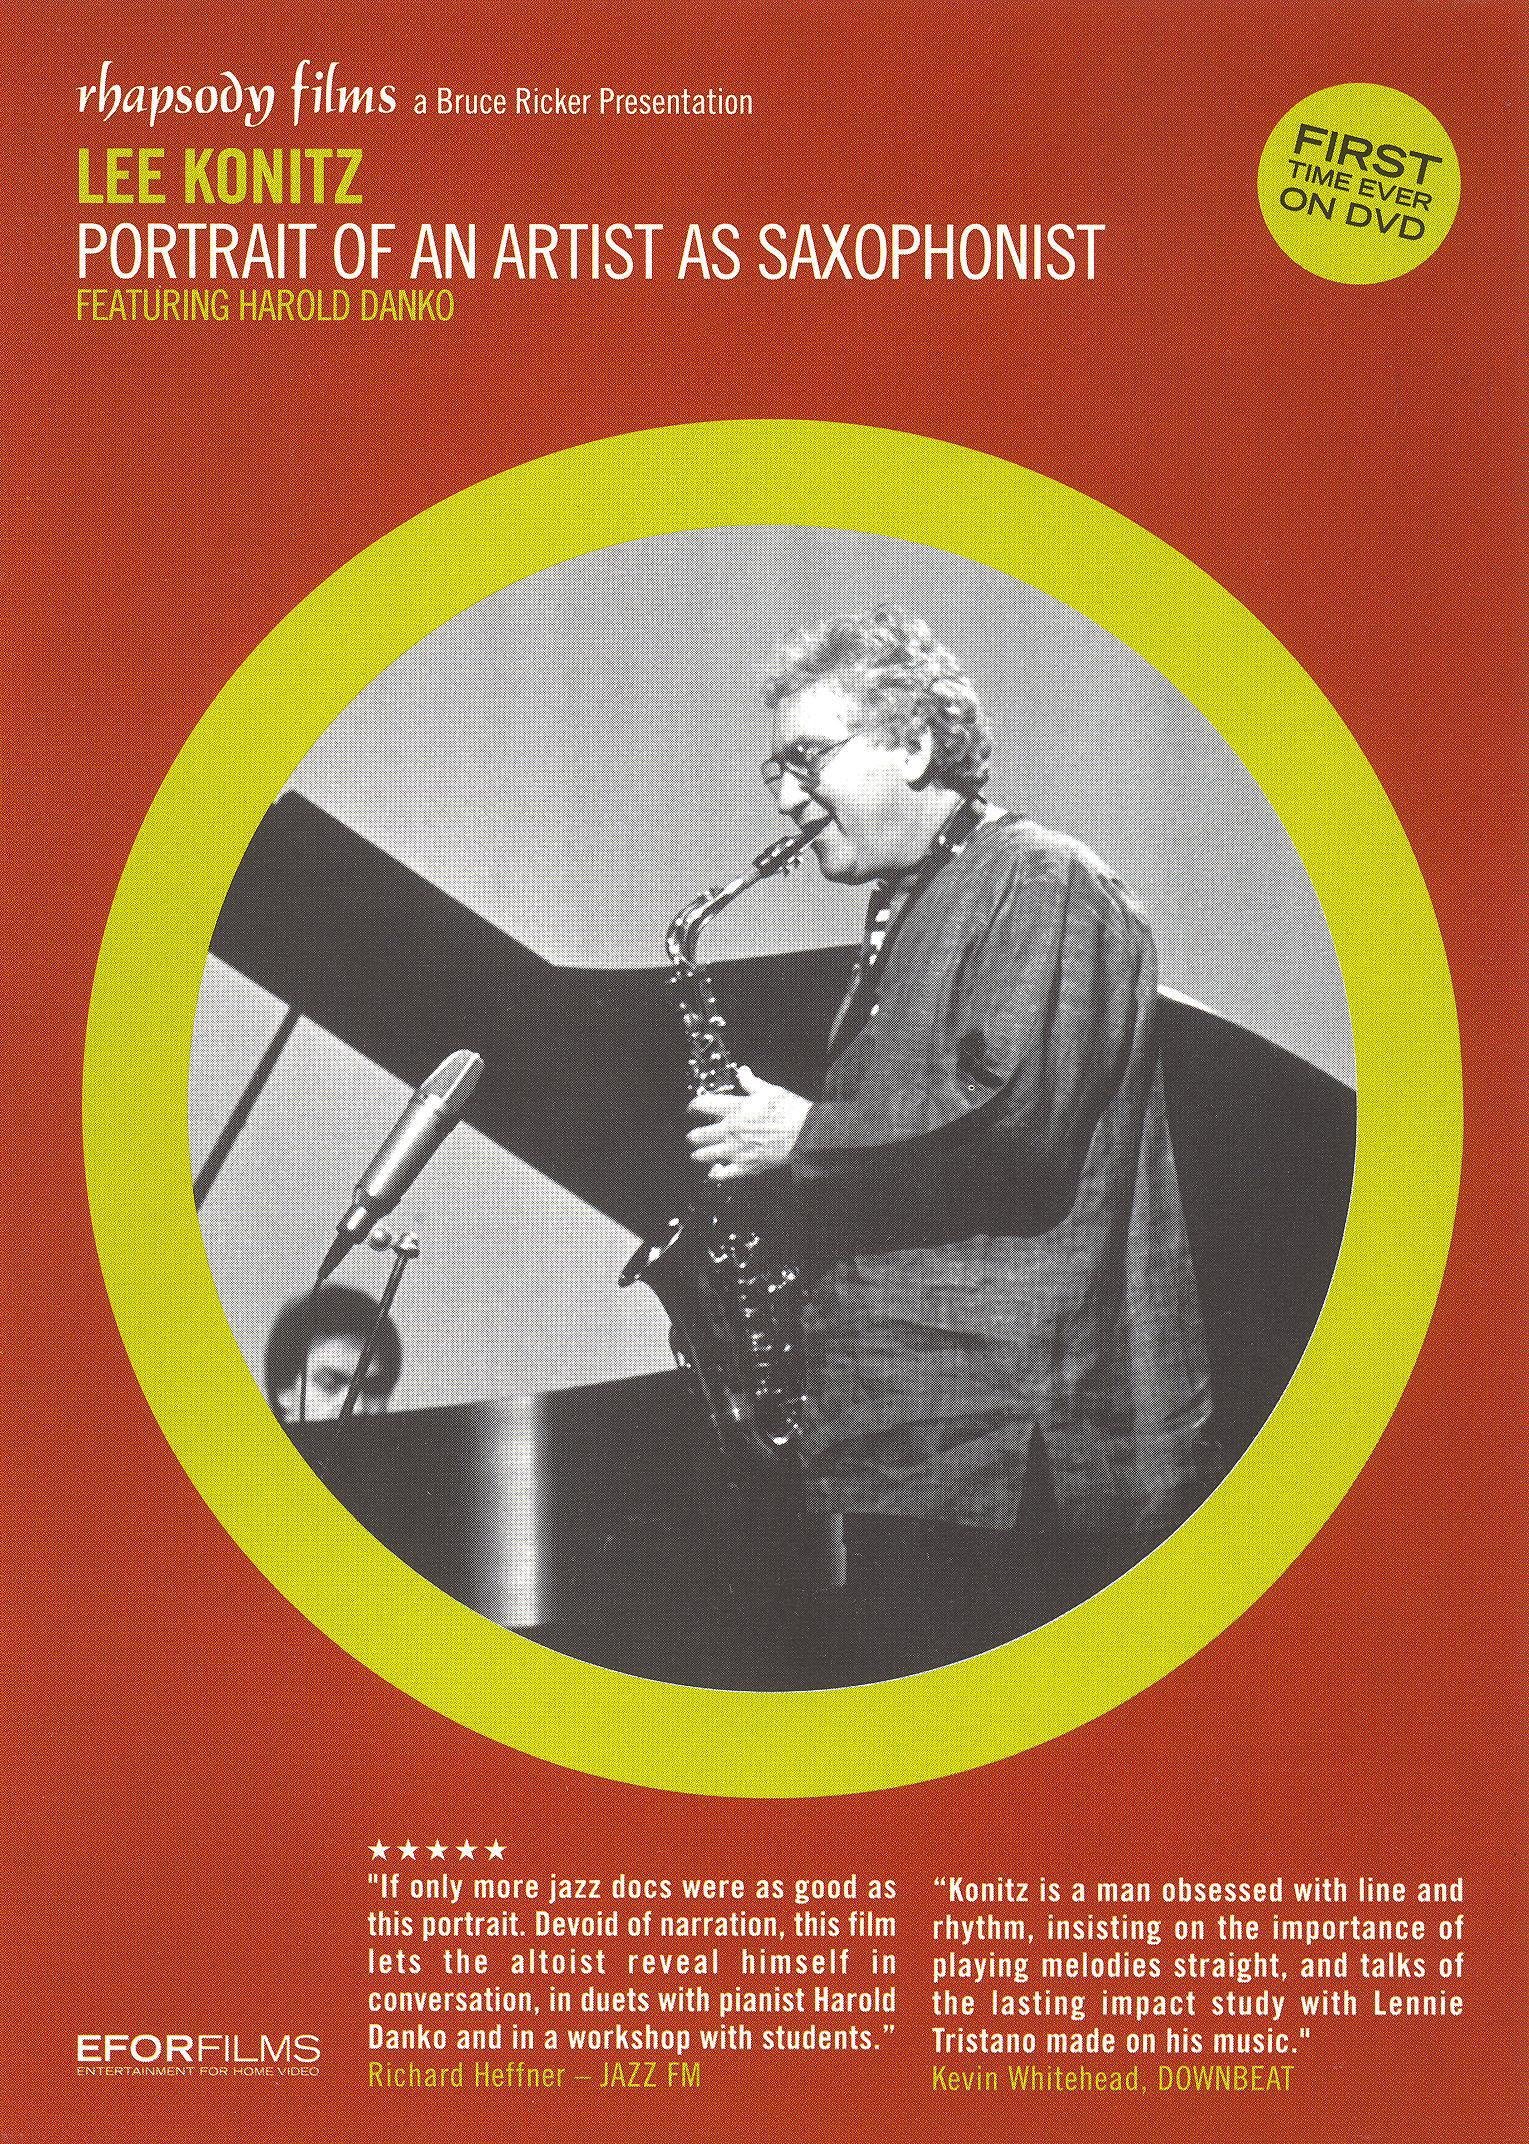 Lee Konitz: Portrait of an Artist as Saxophonist